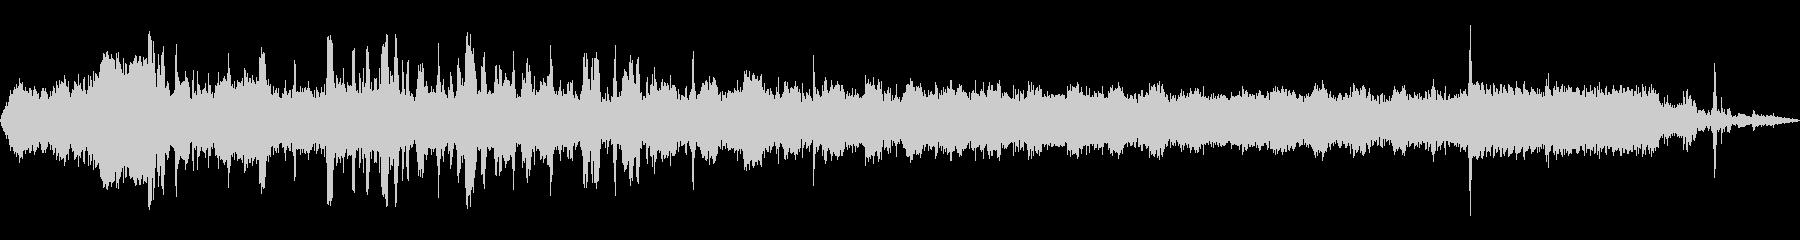 INT:BEEPER、RADIO ...の未再生の波形